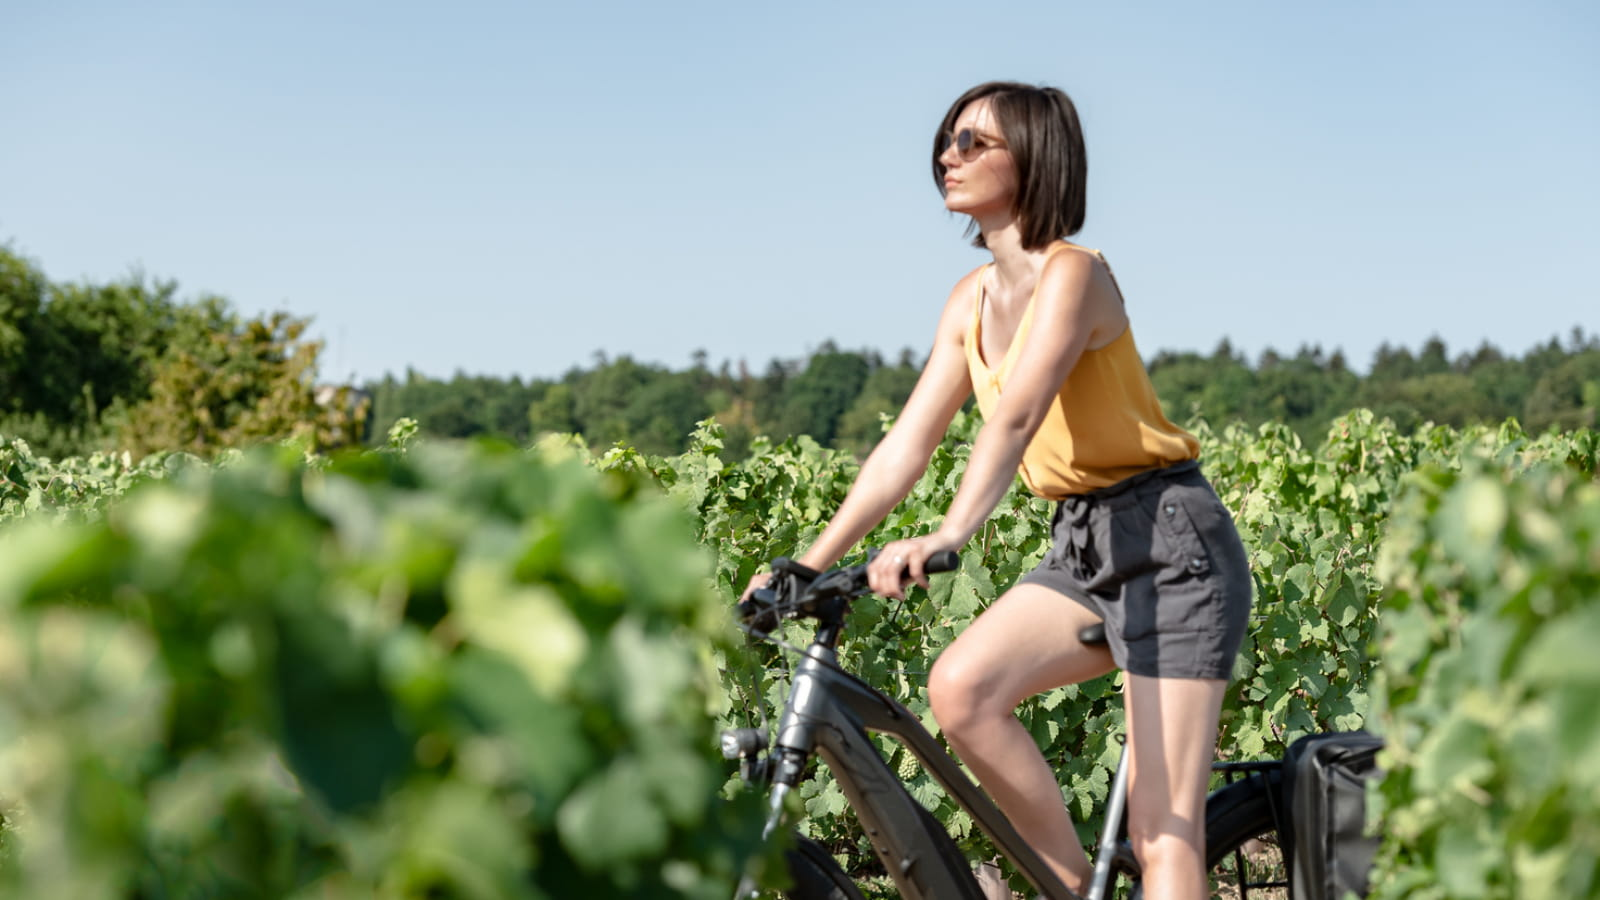 Sortie vélo au coeur des vignes